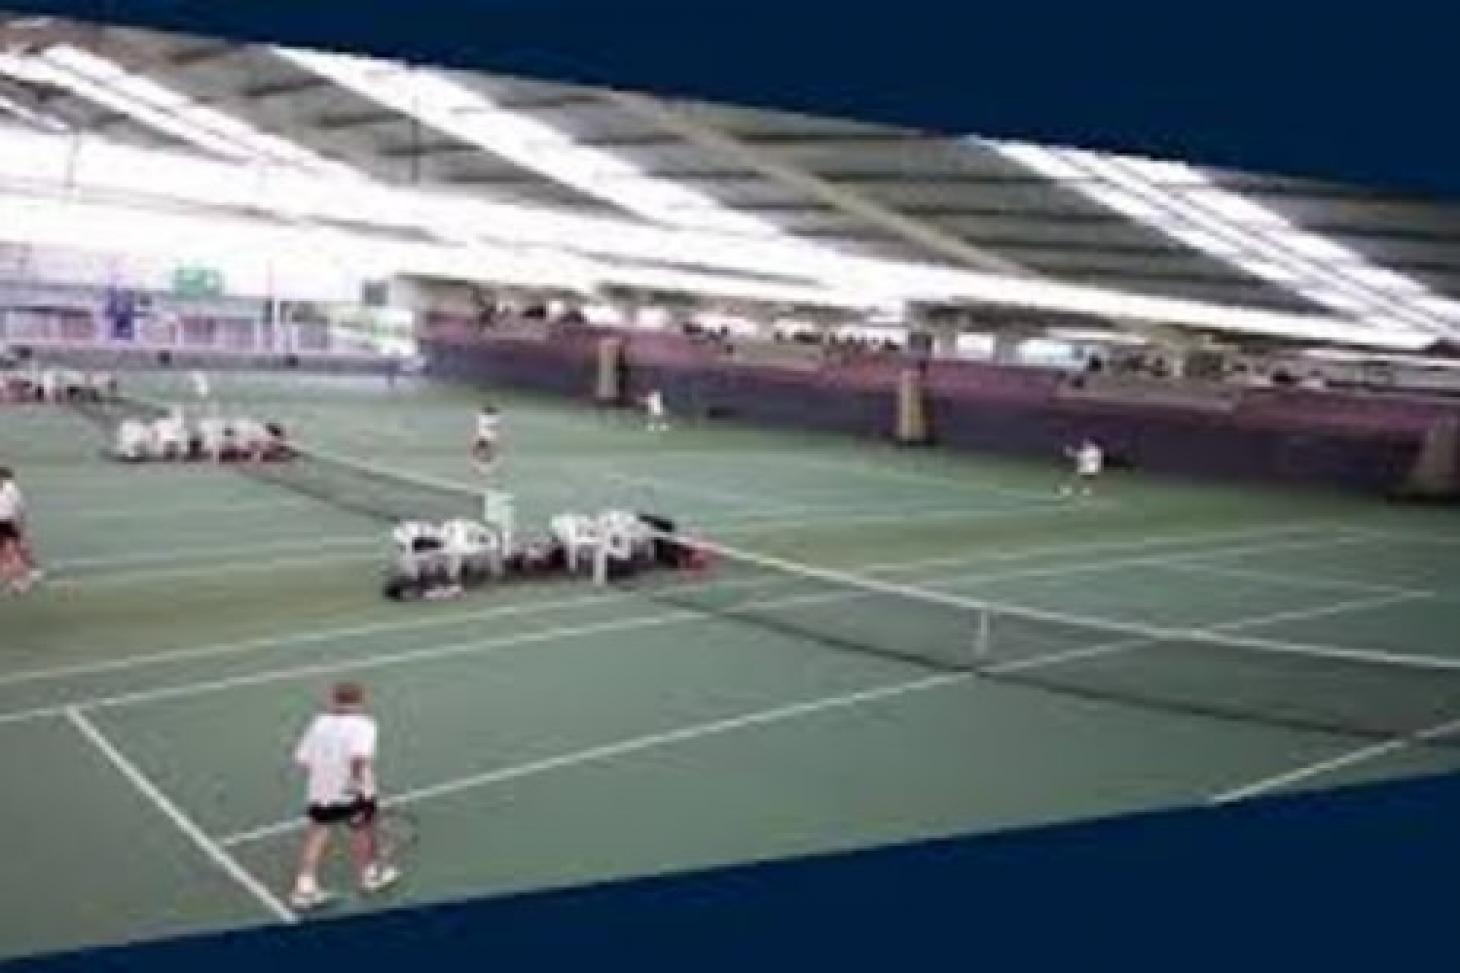 Redbridge Sports Centre Indoor tennis court